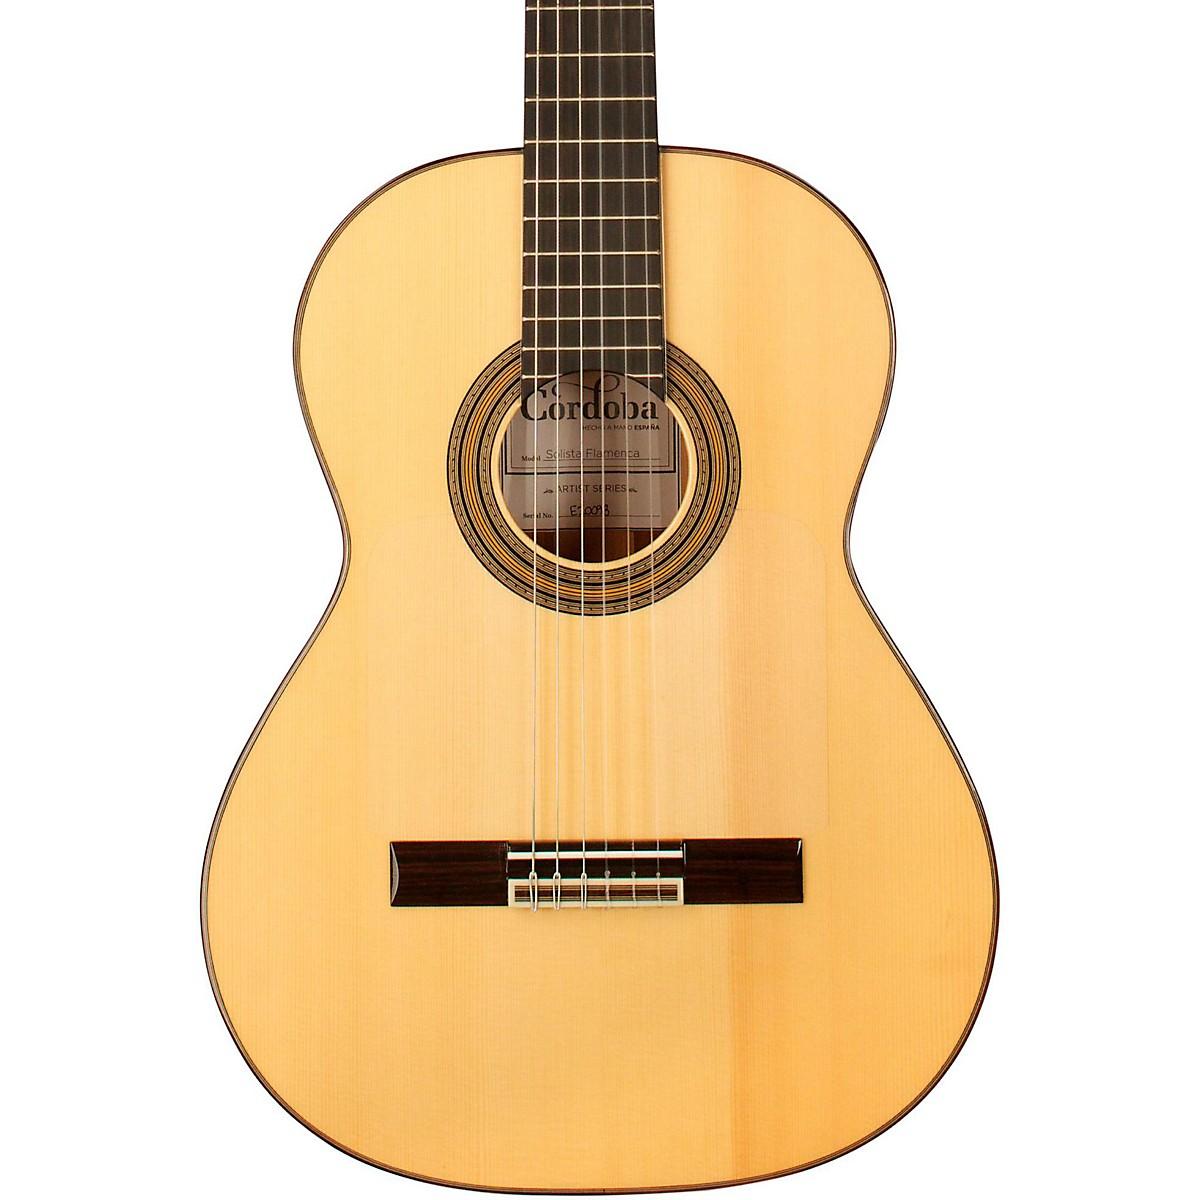 Cordoba Solista Flamenca Acoustic Nylon String Flamenco Guitar